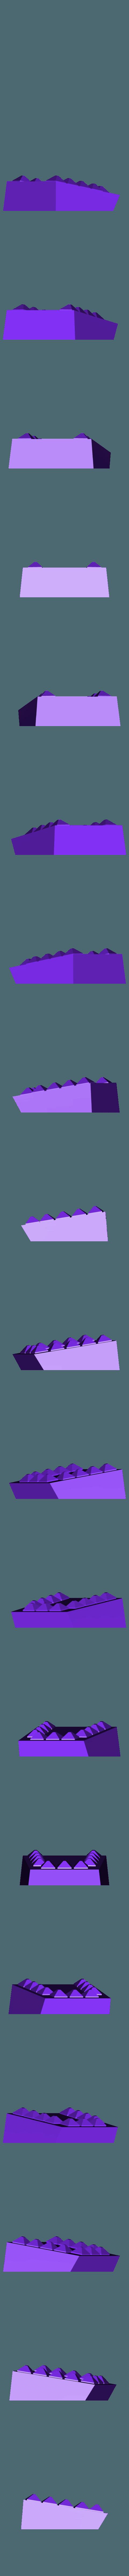 Jaw.STL Download STL file Grimlock • Model to 3D print, biglildesign